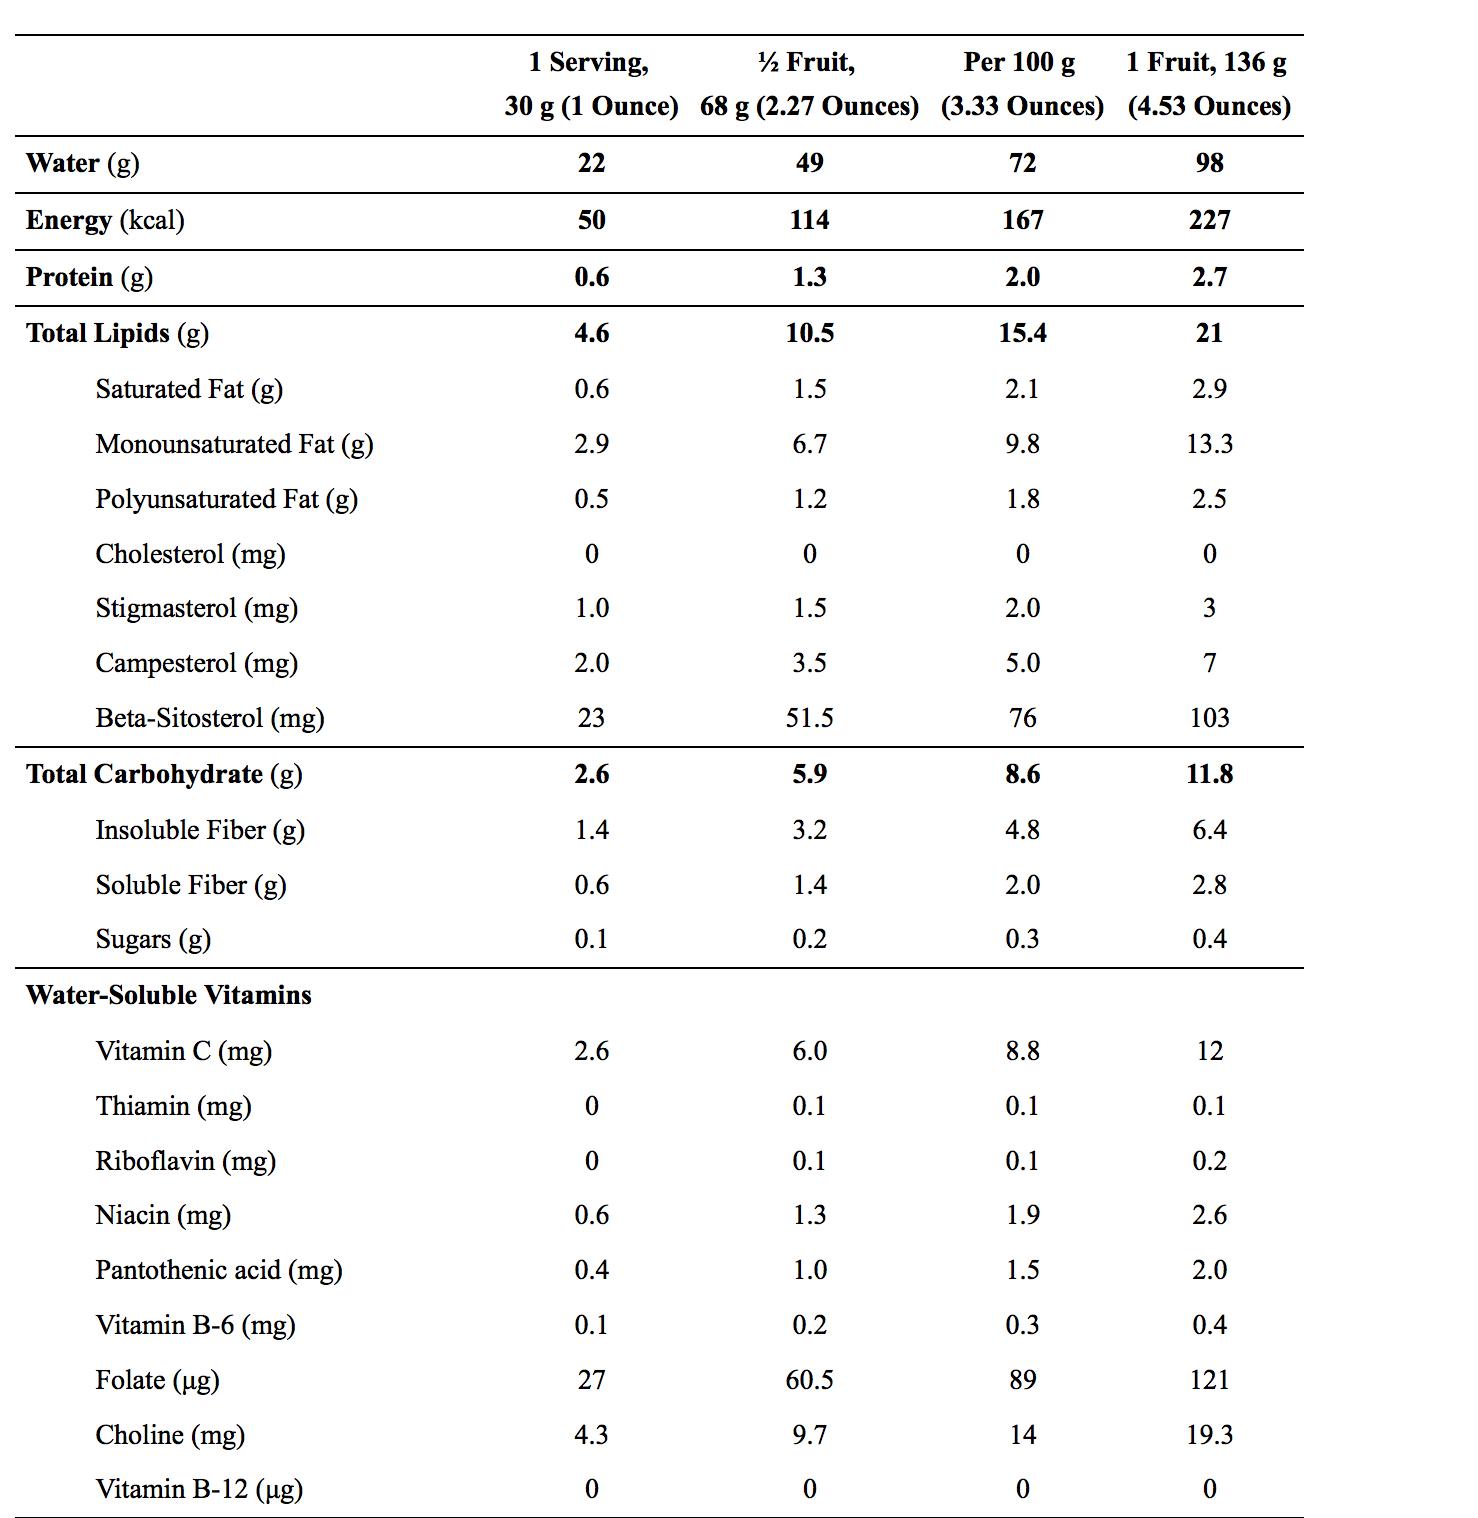 Proprietà nutrizionali Avocado - Fonte USDA 2015